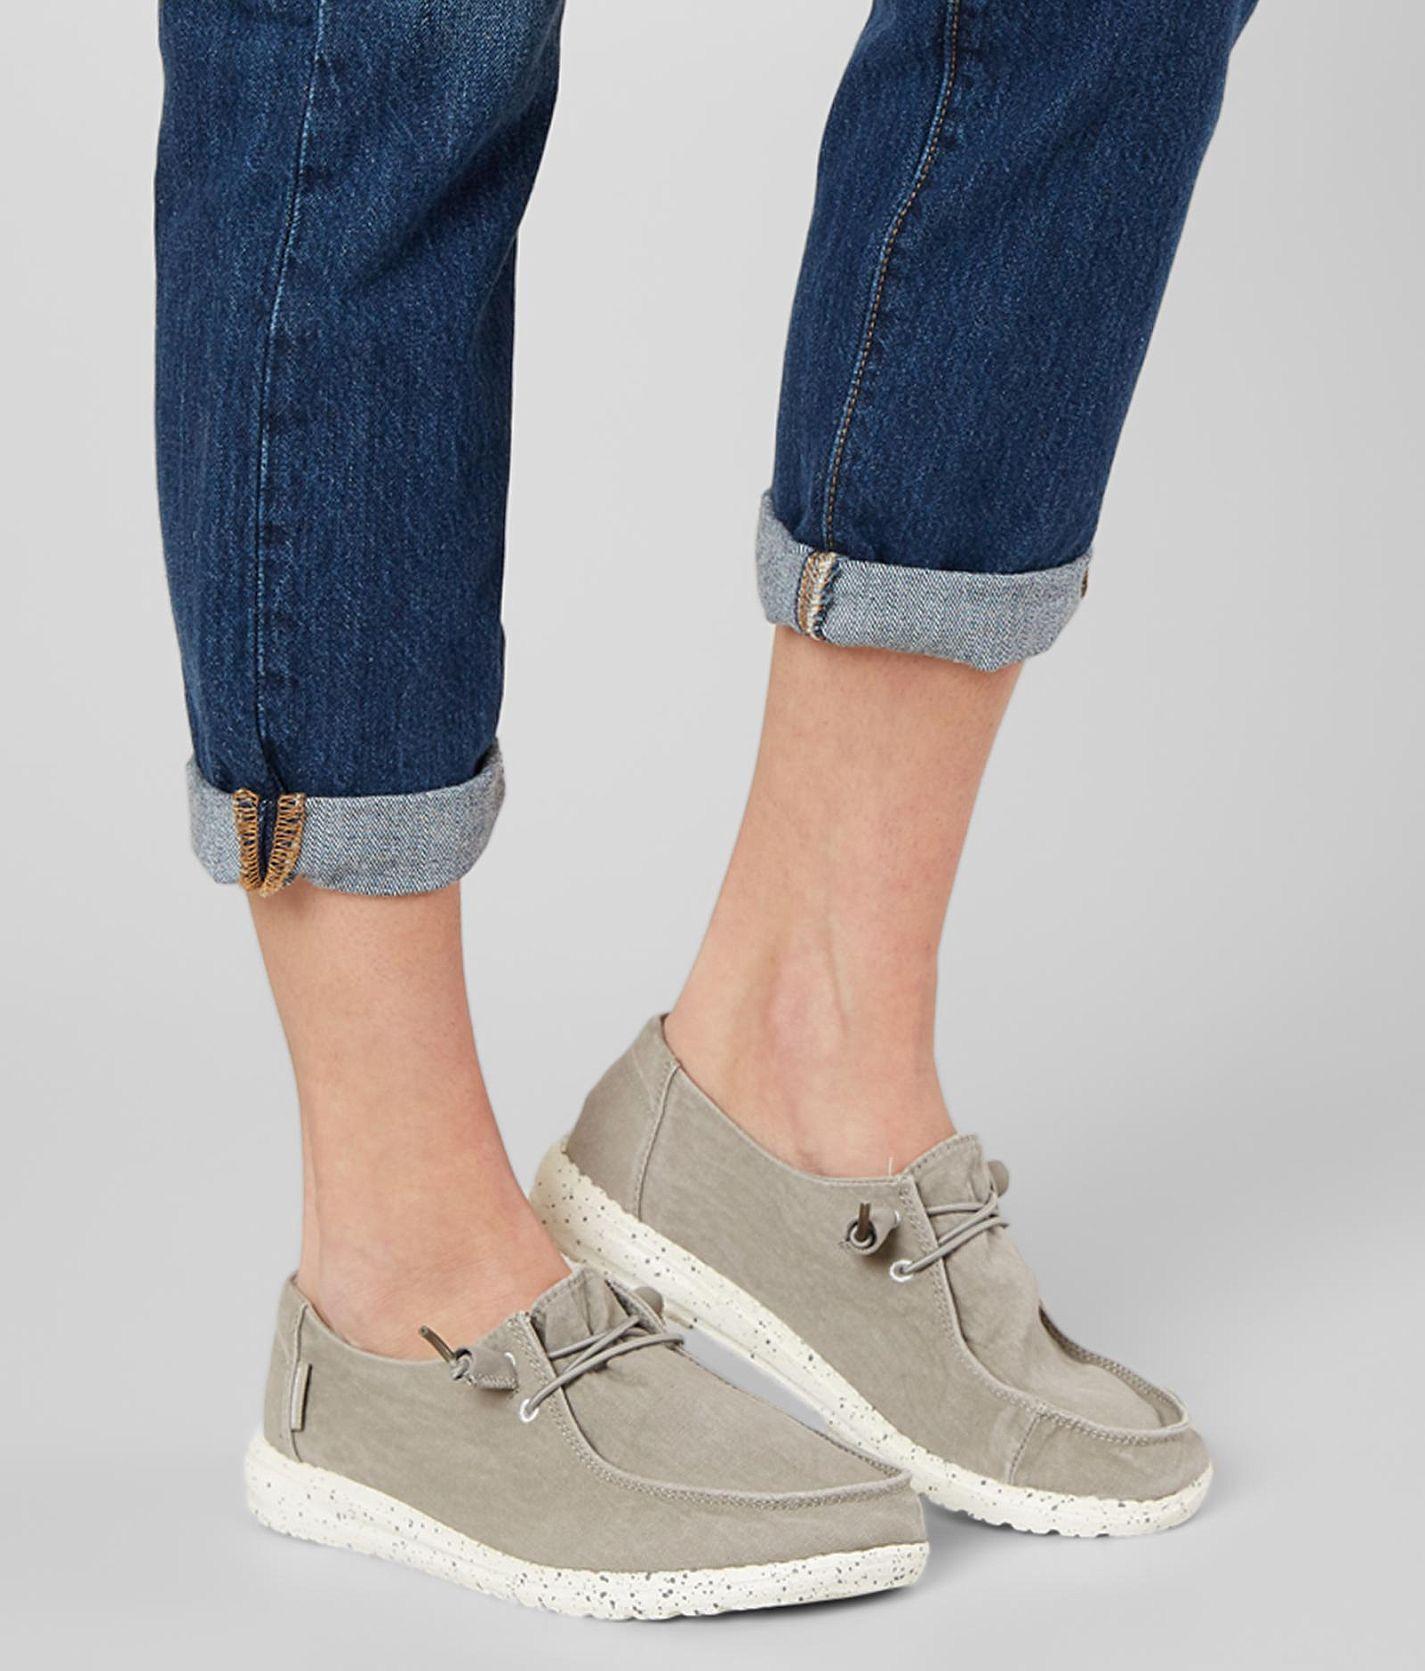 Hey Dude Wendy Shoe - Women's Shoes in